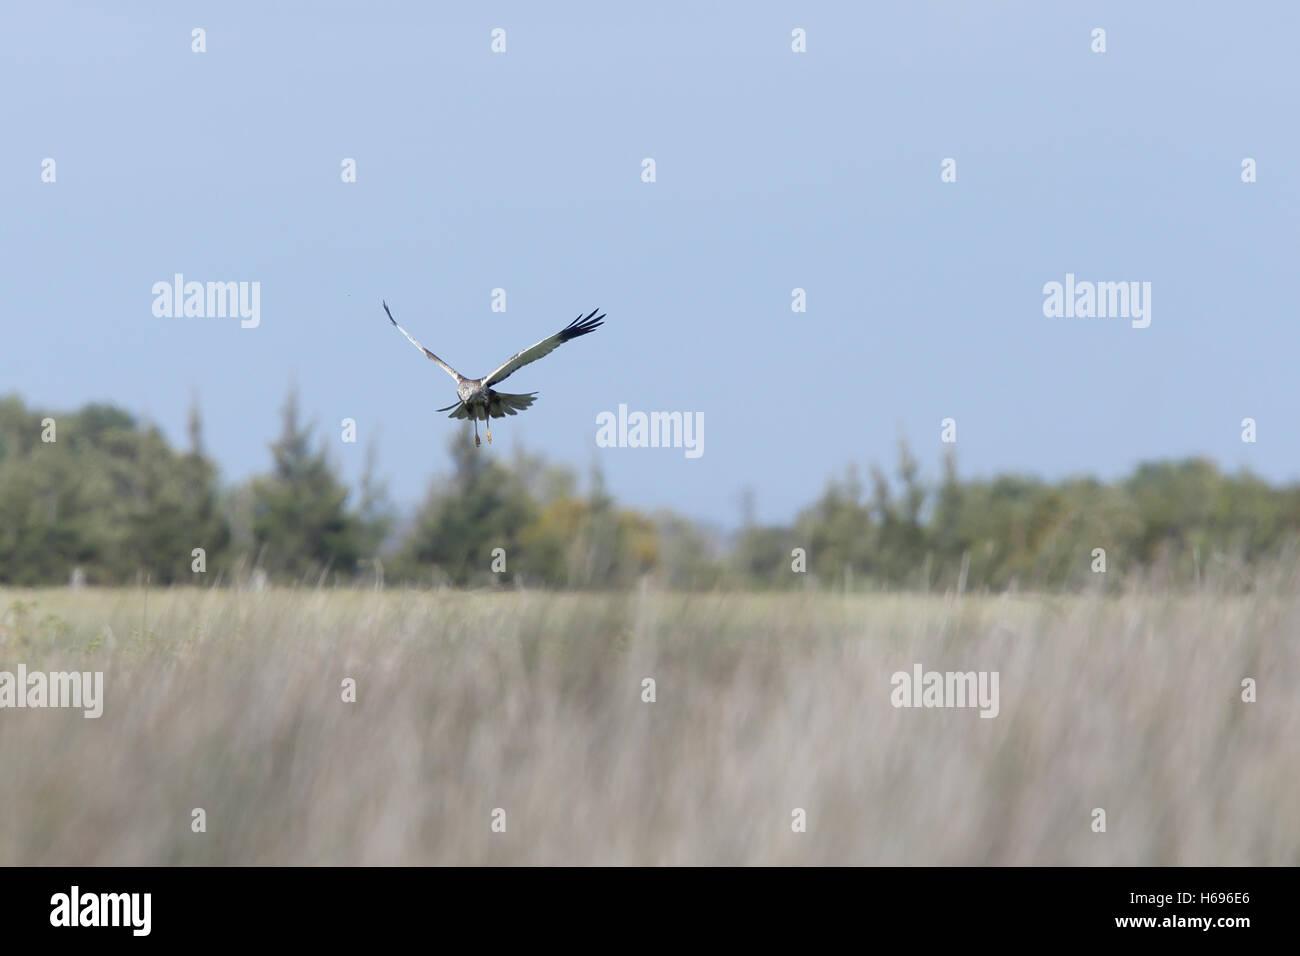 Marsh Harrier (Circus aeruginosus) male hovering low over the marsh, Merja Zerga, Morocco. - Stock Image